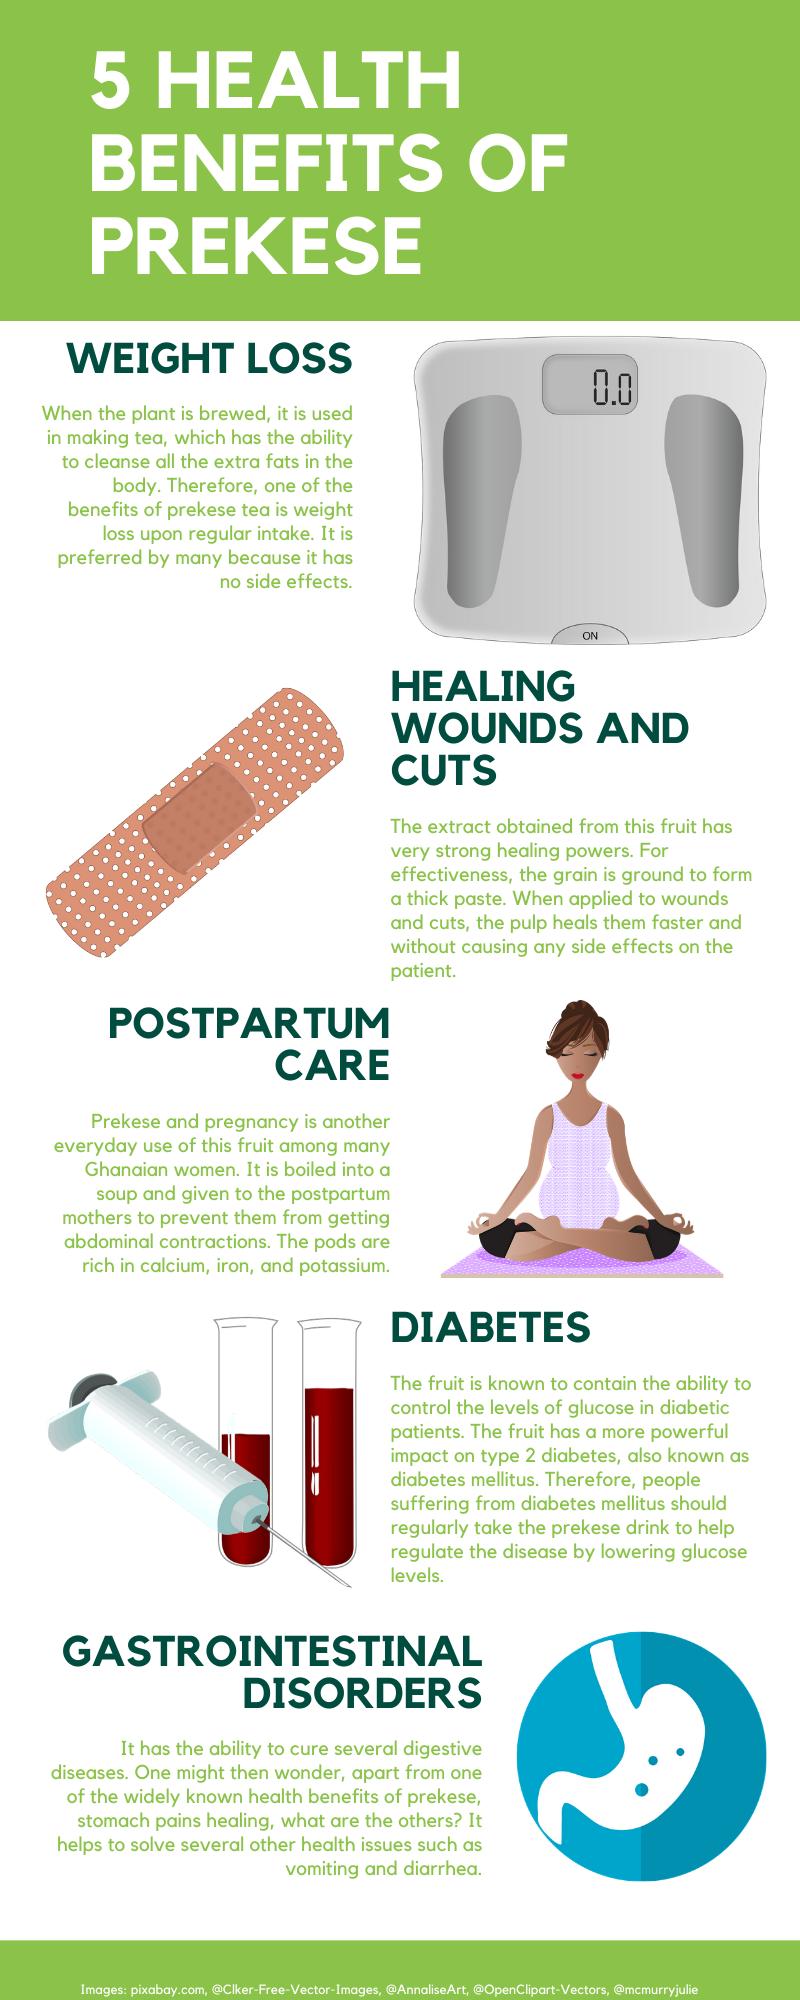 Prekese health benefits